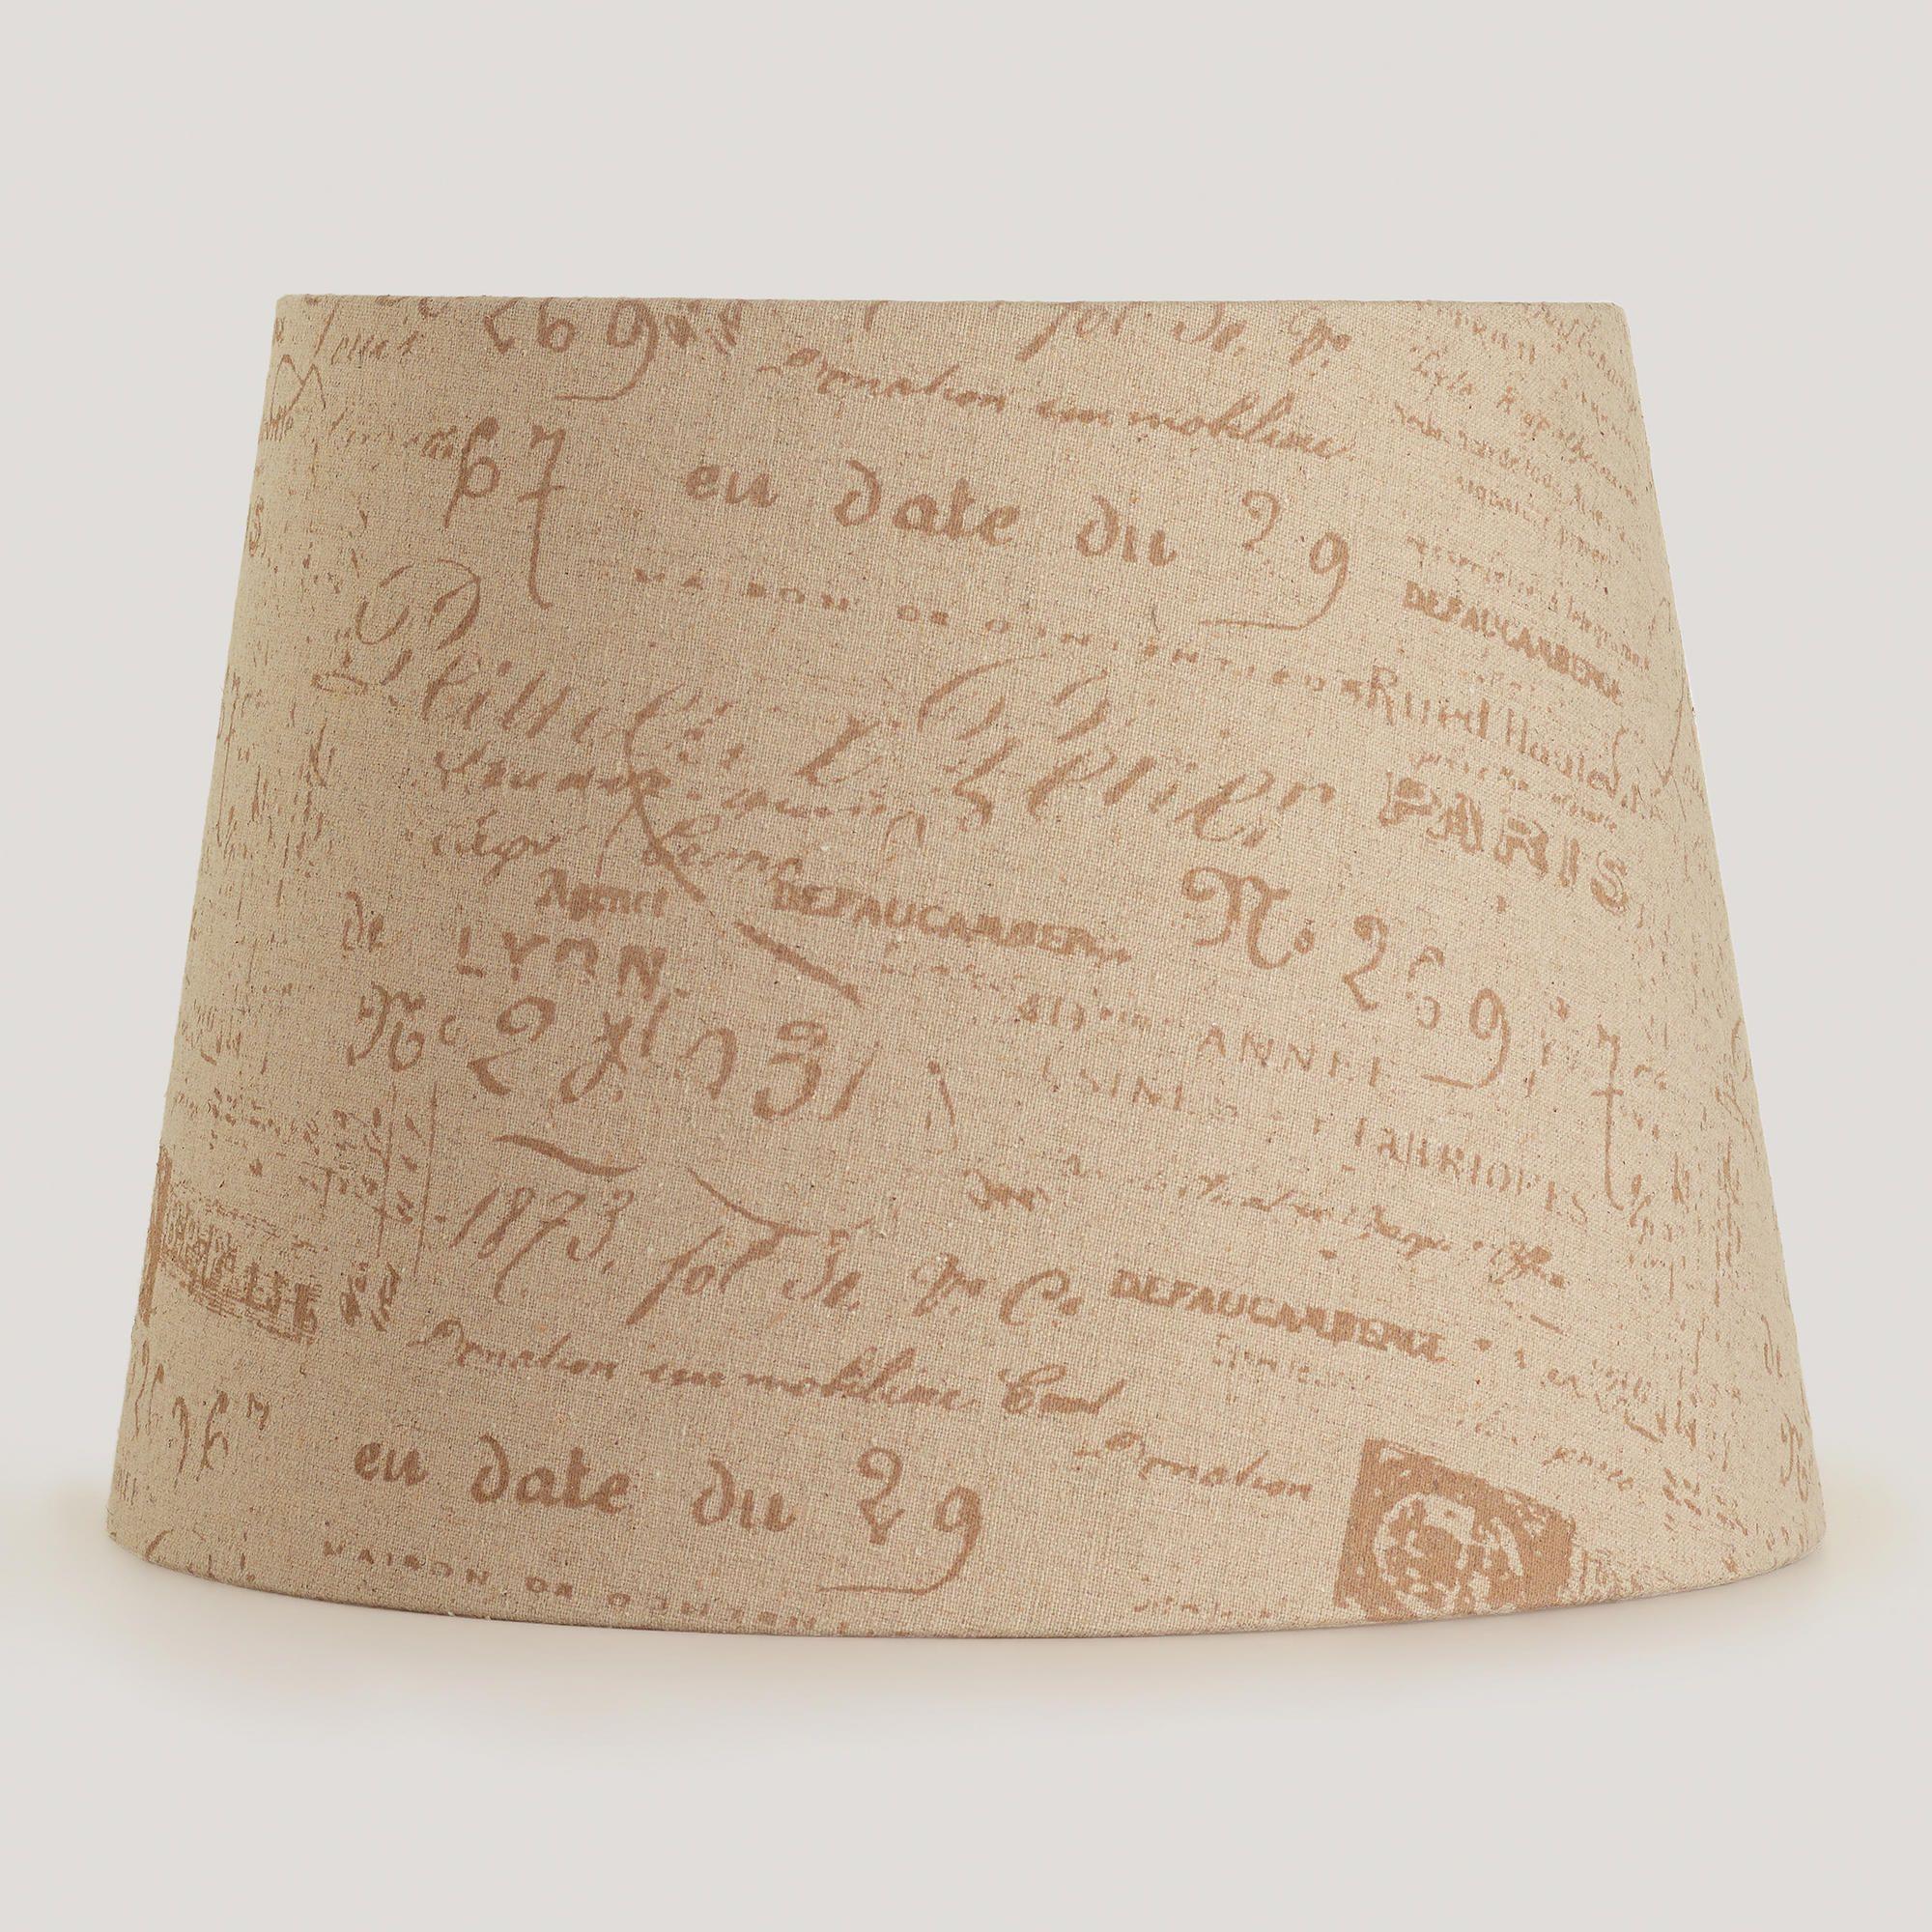 World Market Lamp Shades Parisian Script Table Lamp Shade  World Market  Products I Love